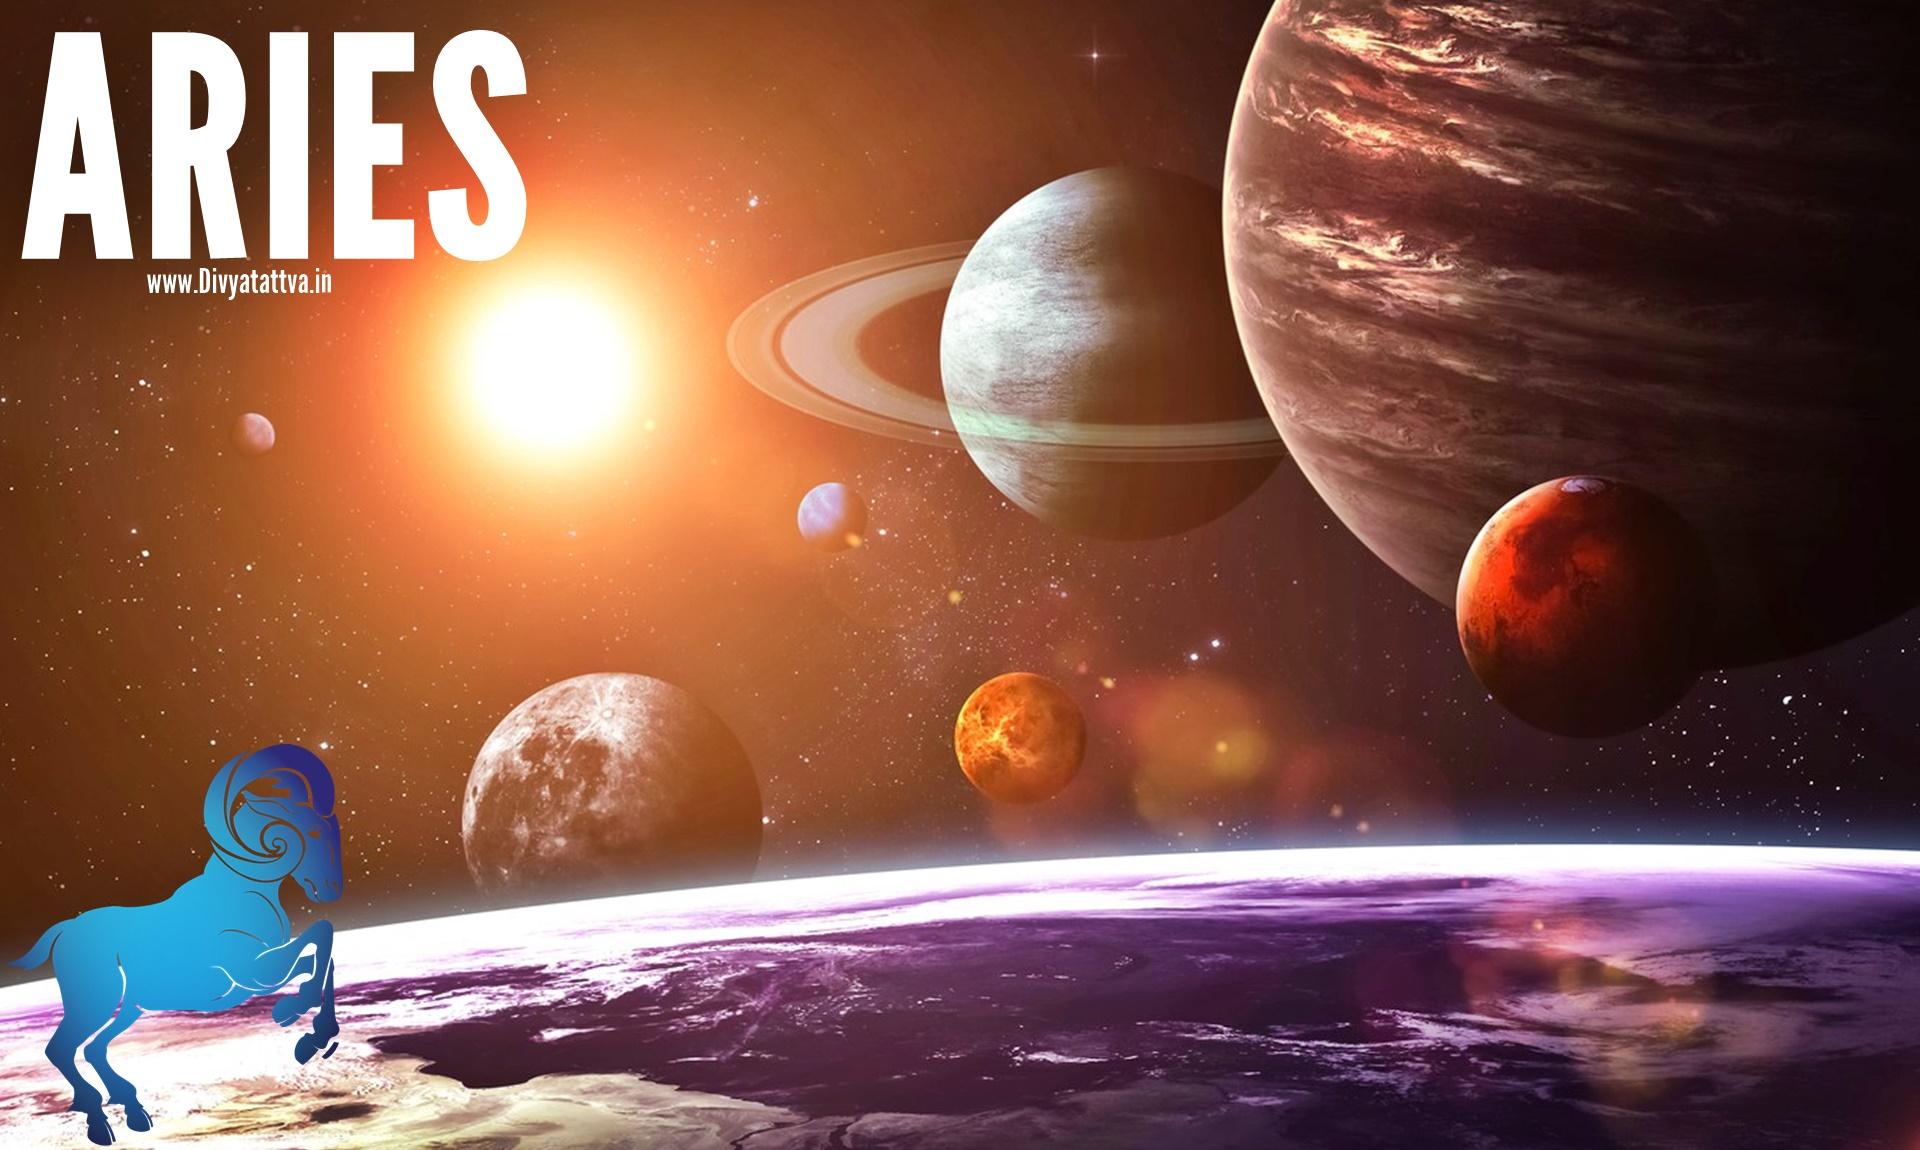 Free Astrology zodiac signs wallpaper online, free horoscope aries tarurus gemini cancer